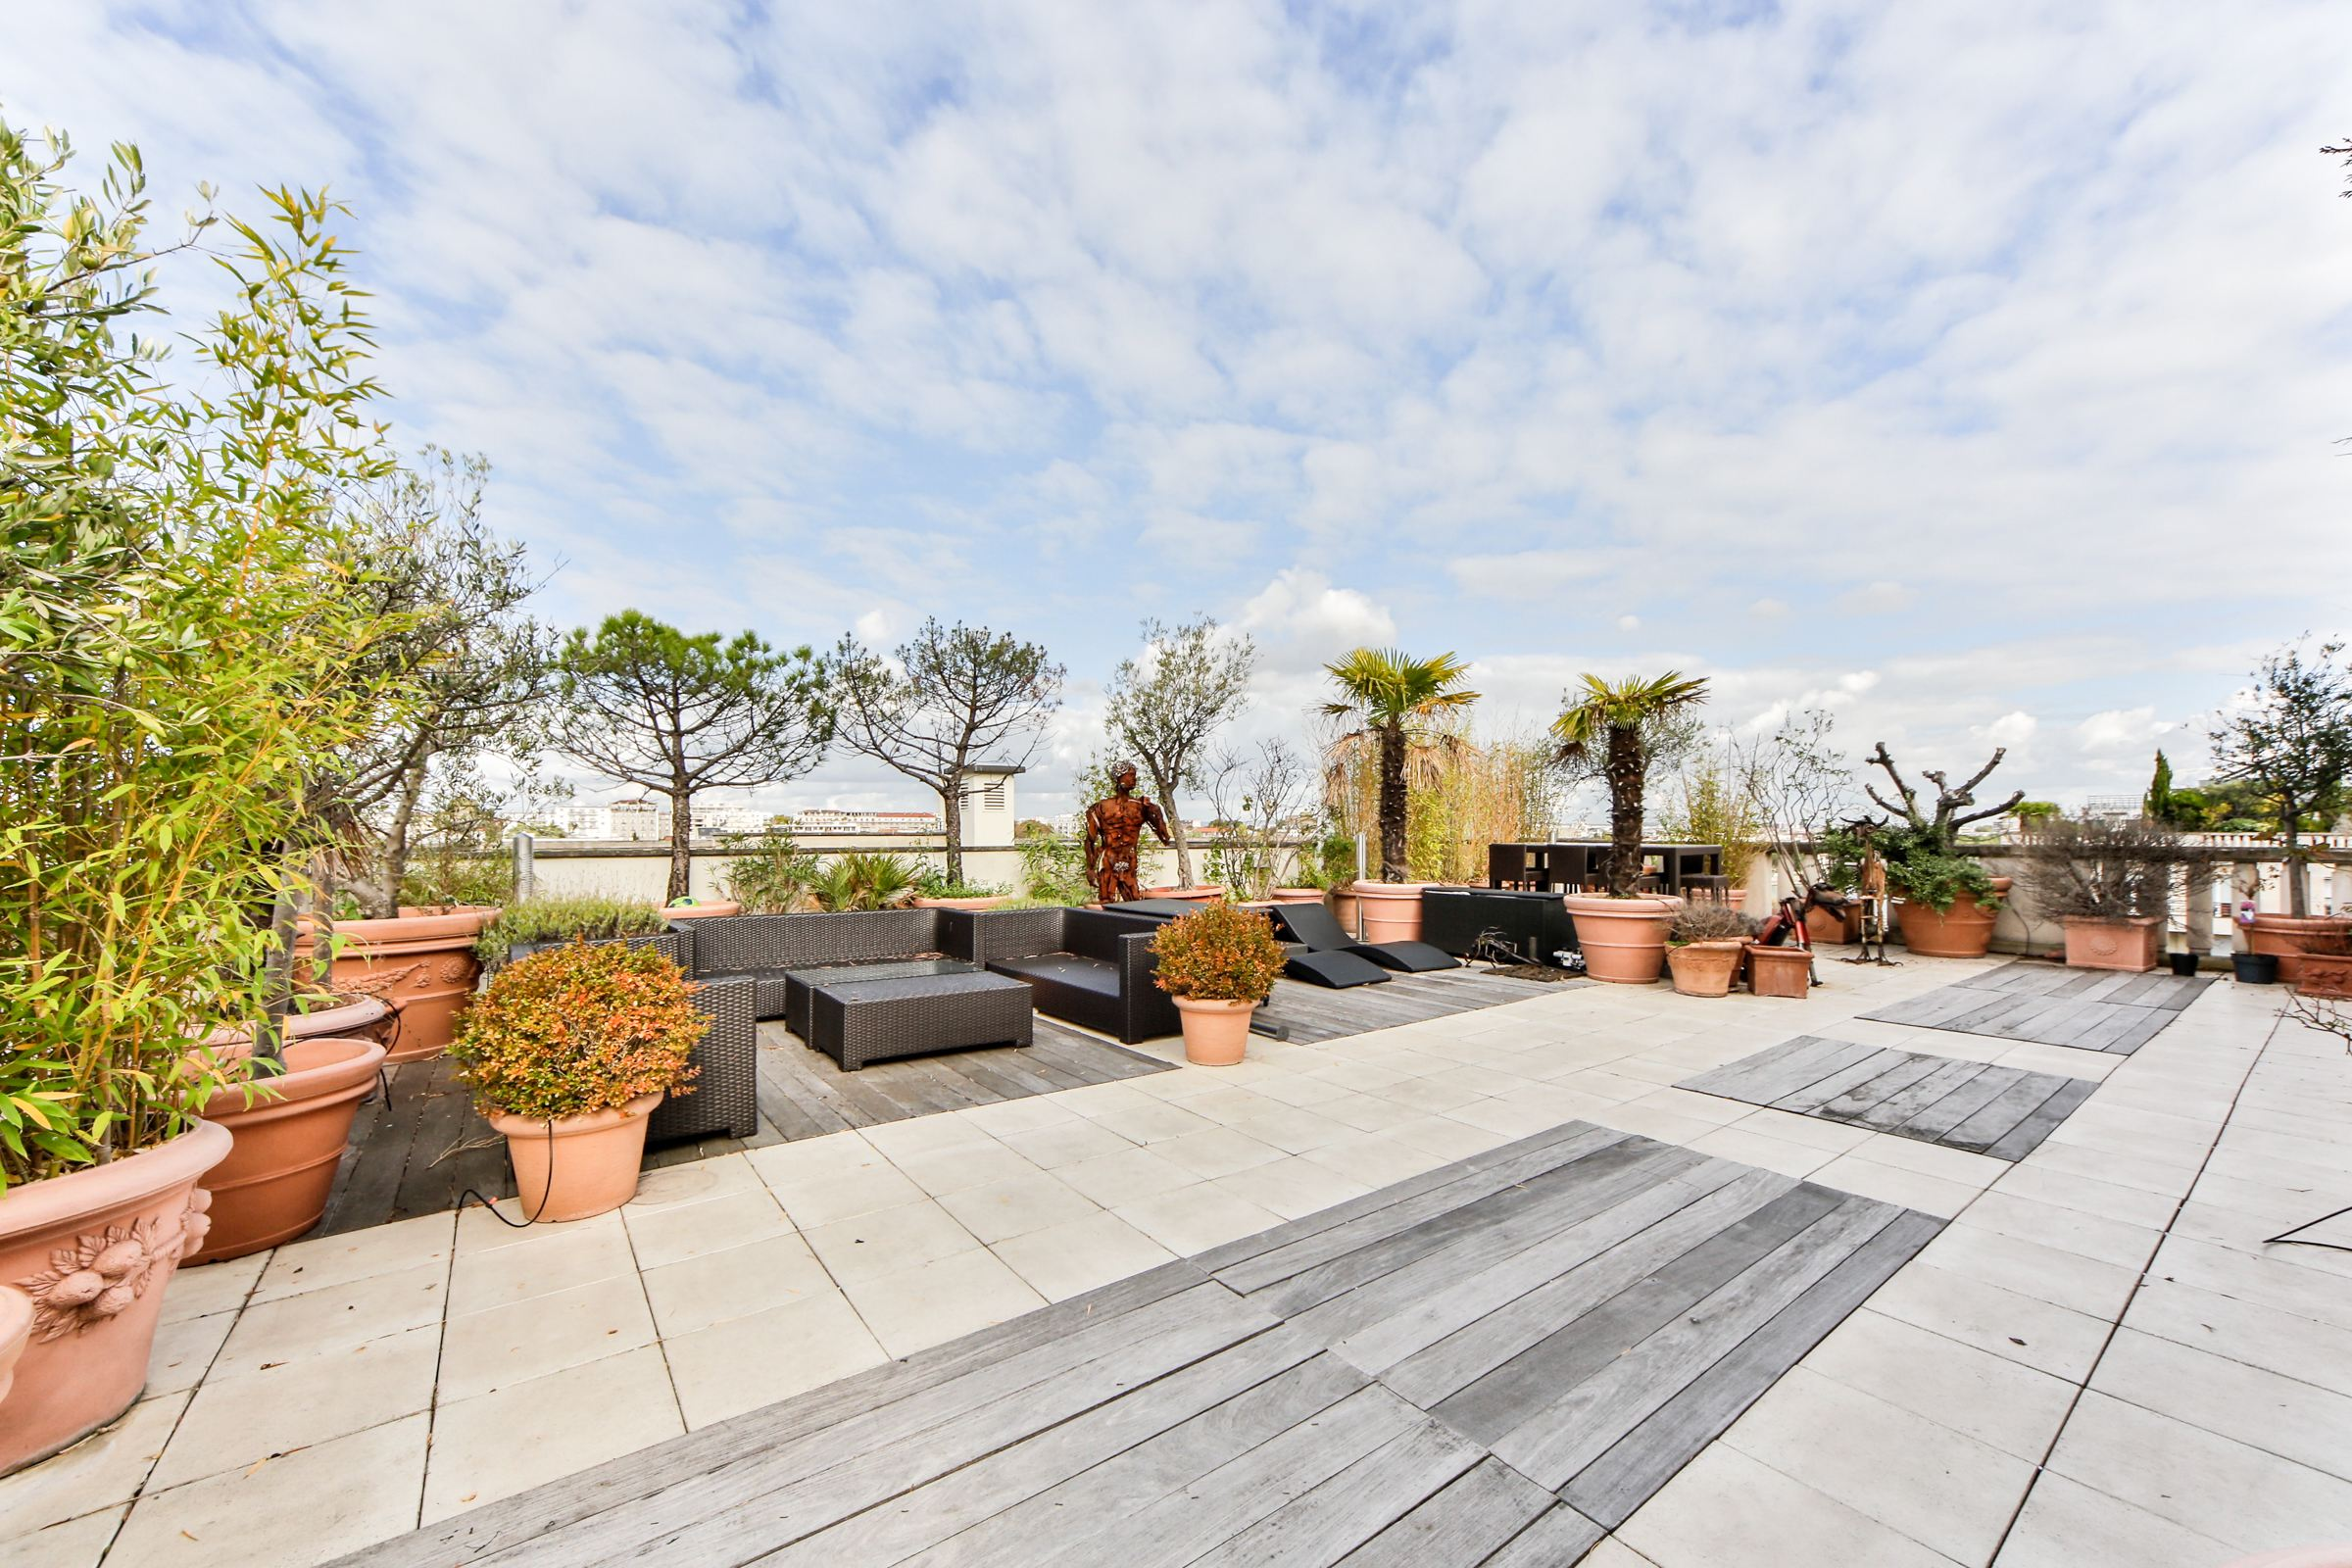 Property For Sale at Levallois - Greffulhe. A 160 sq.m Penthouse + a 350 sq.m terraces.